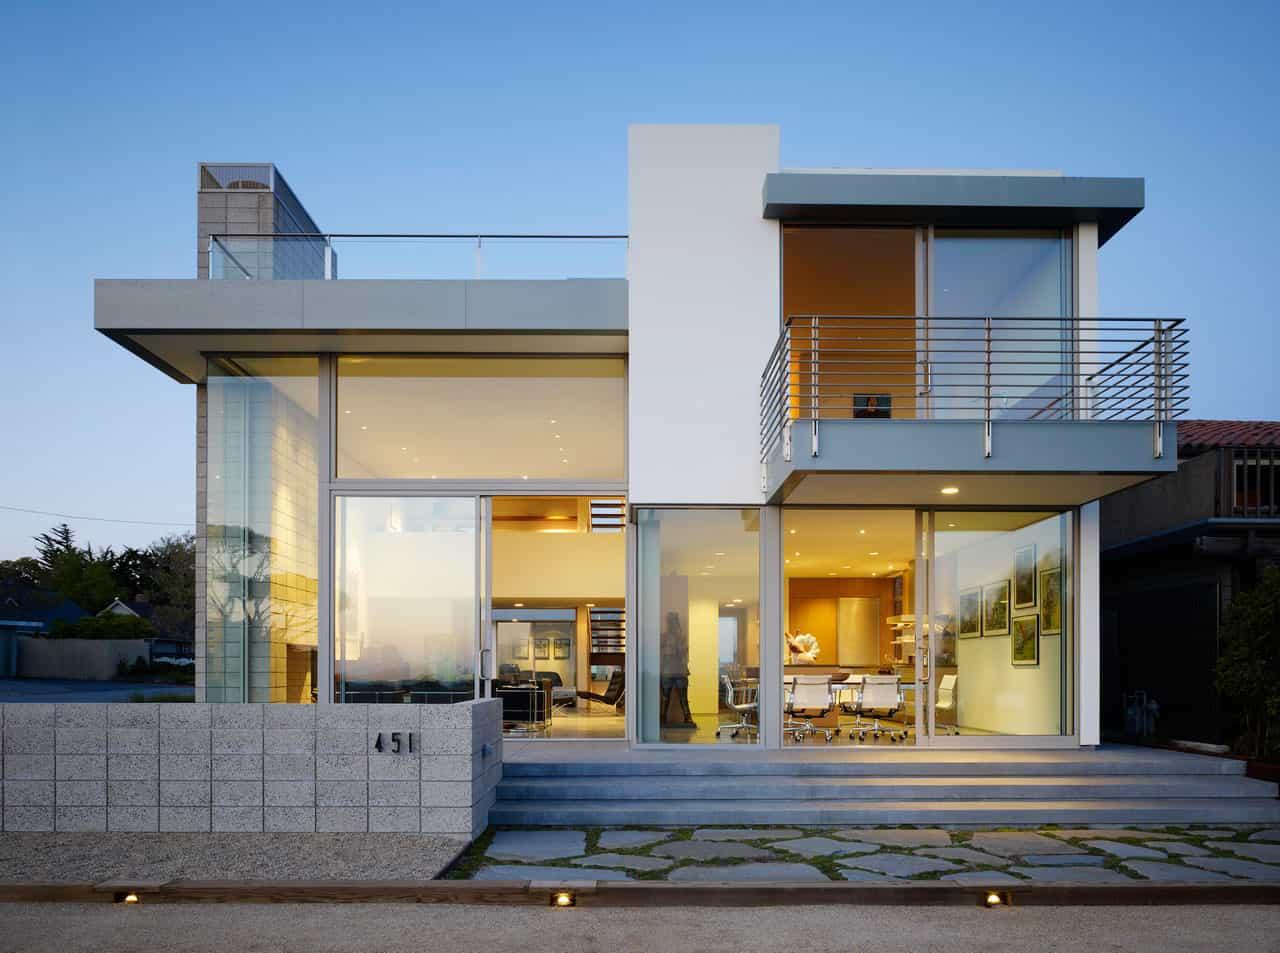 Zeidler Residence by Ehrlich Architects